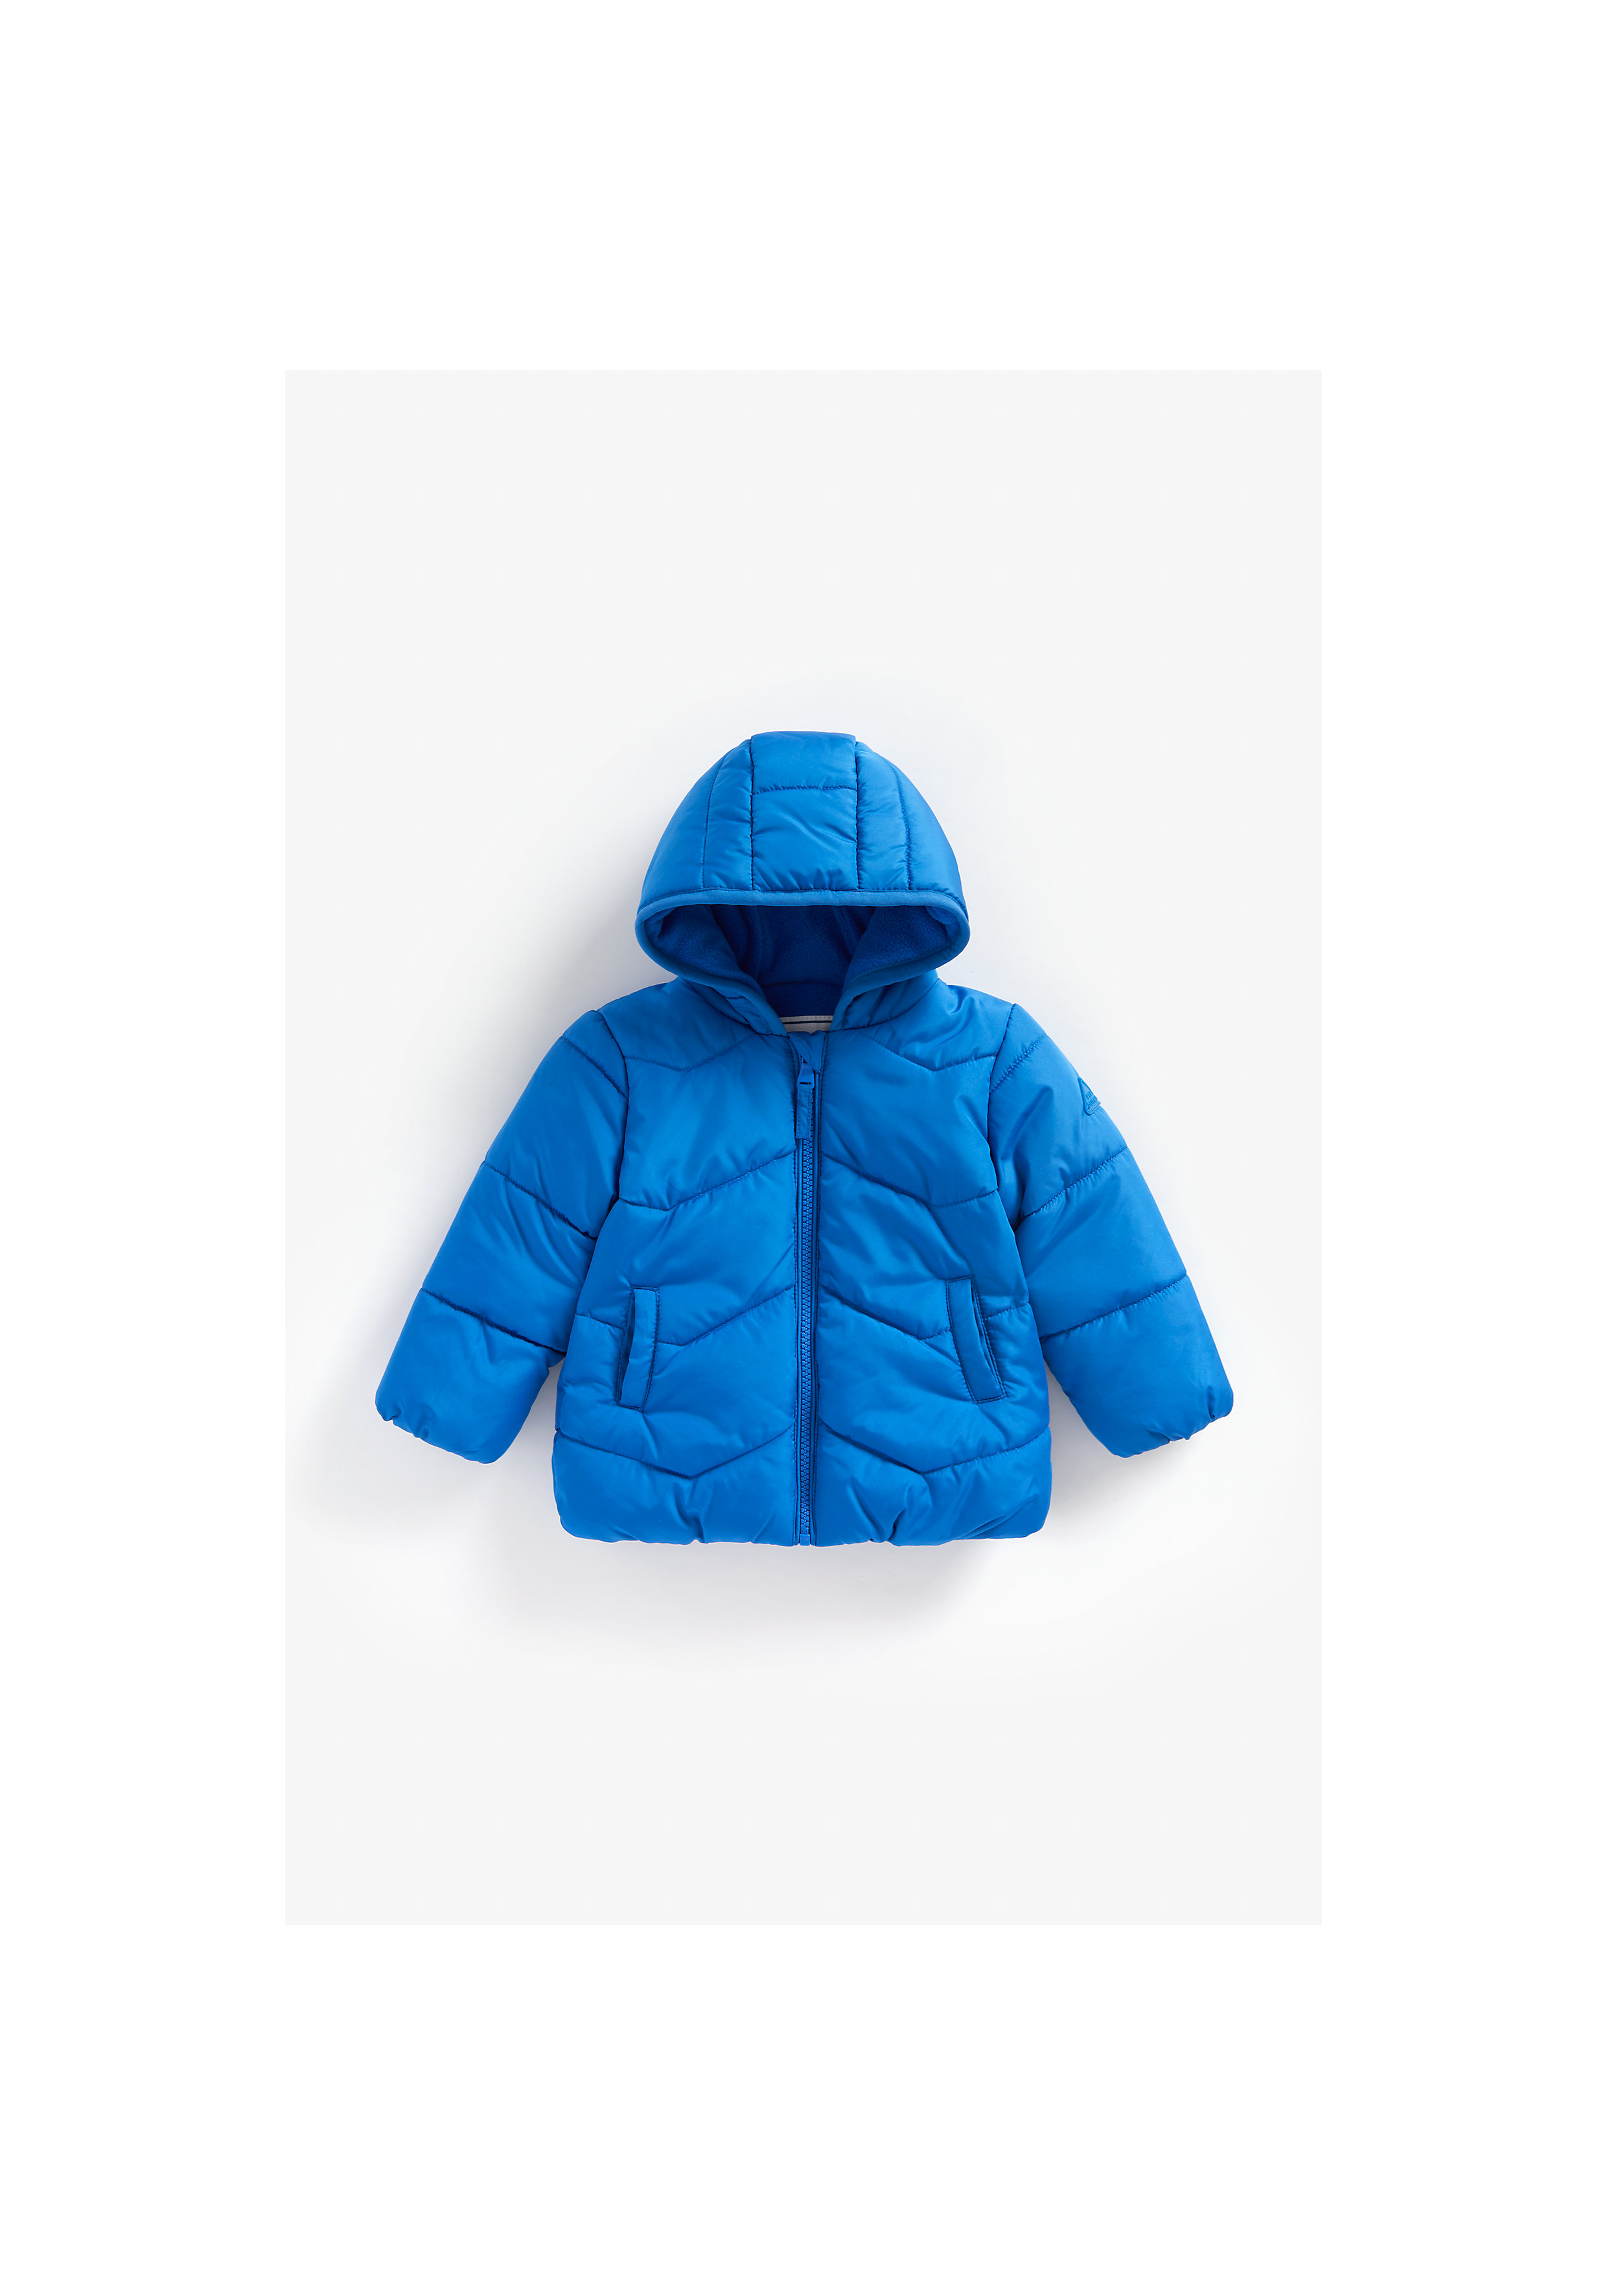 Mothercare | Boys Full Sleeves Fleece Lined Jacket Hooded - Blue